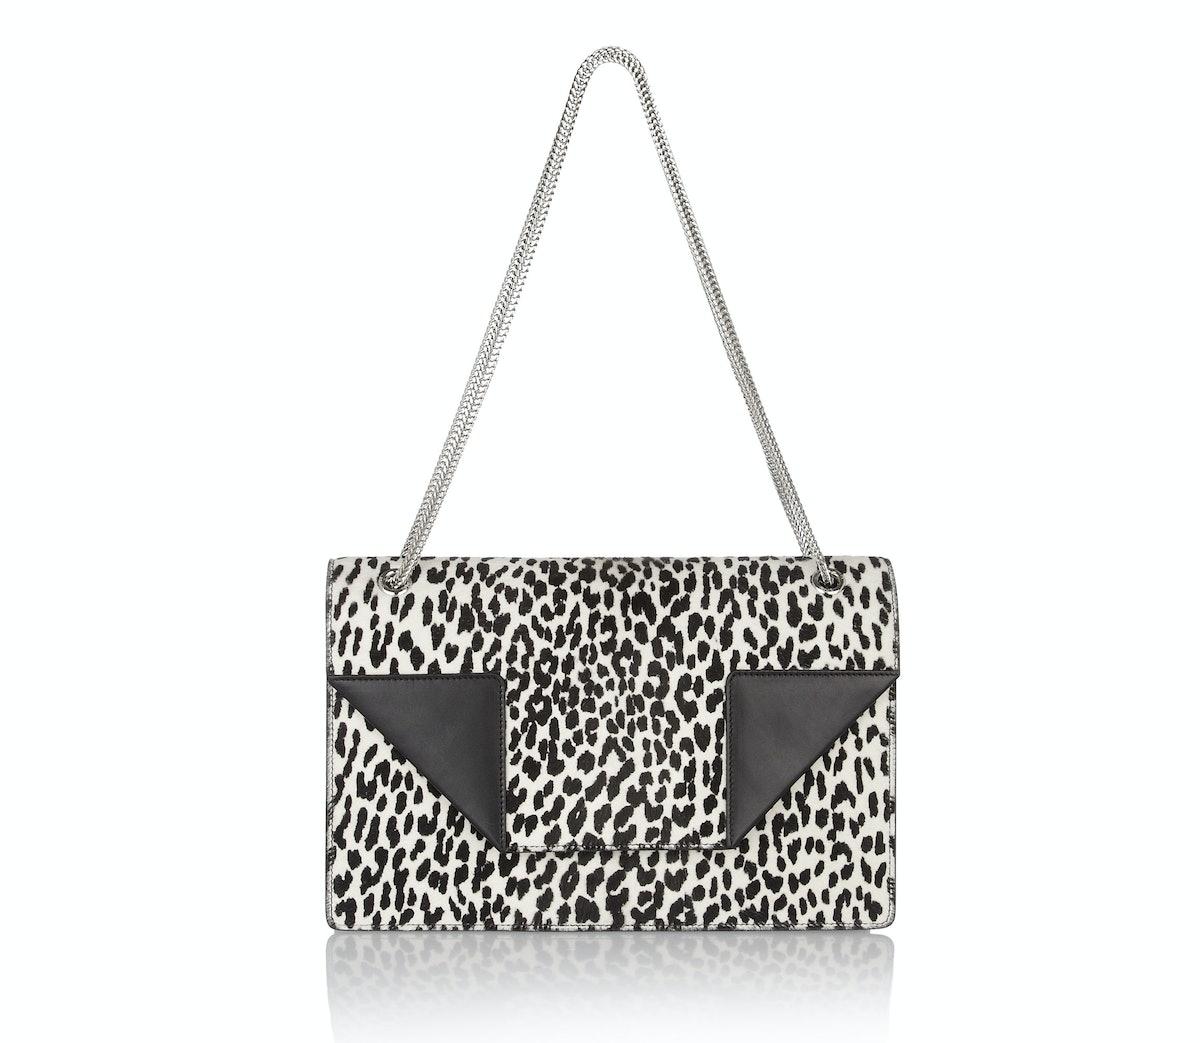 animal-print-accessories-fall-2013-04